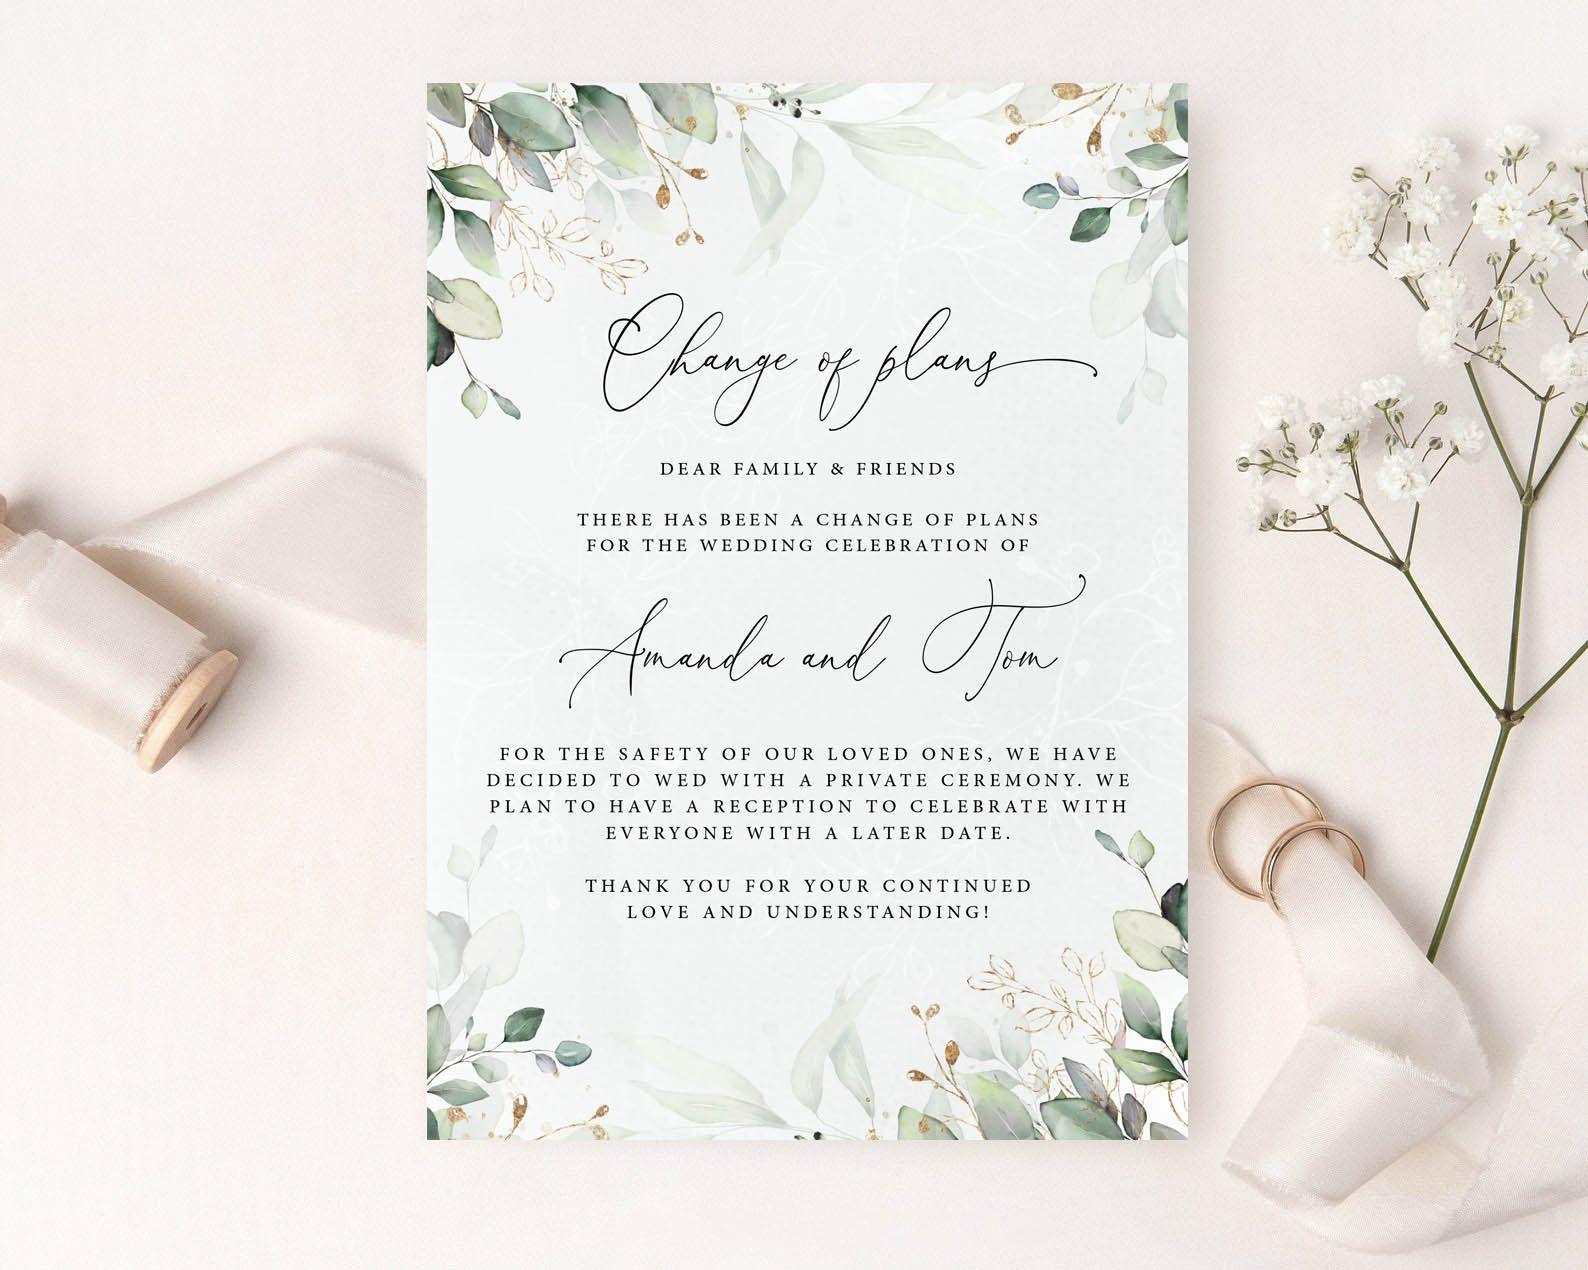 Digital or Printed Cards Wedding Postponement Image Change of Plan Postponed Wedding Wedding Date Change